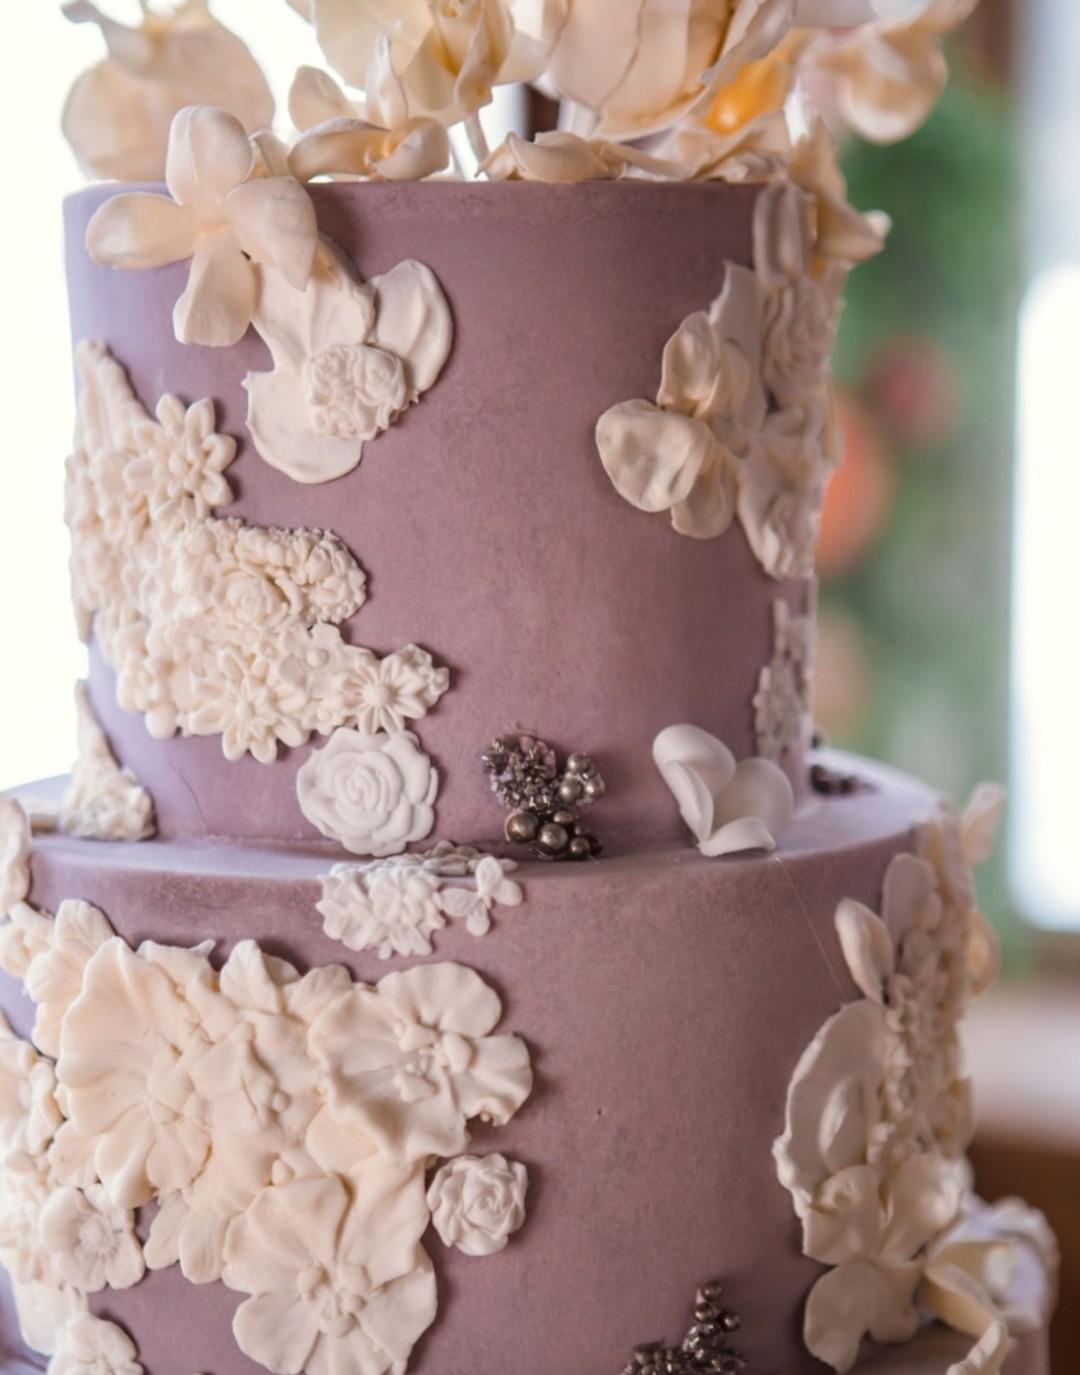 Purple wedding cake: Bohemian wedding inspiration captured by Truly Sublime Photography. See more boho wedding ideas on CHItheeWED.com!